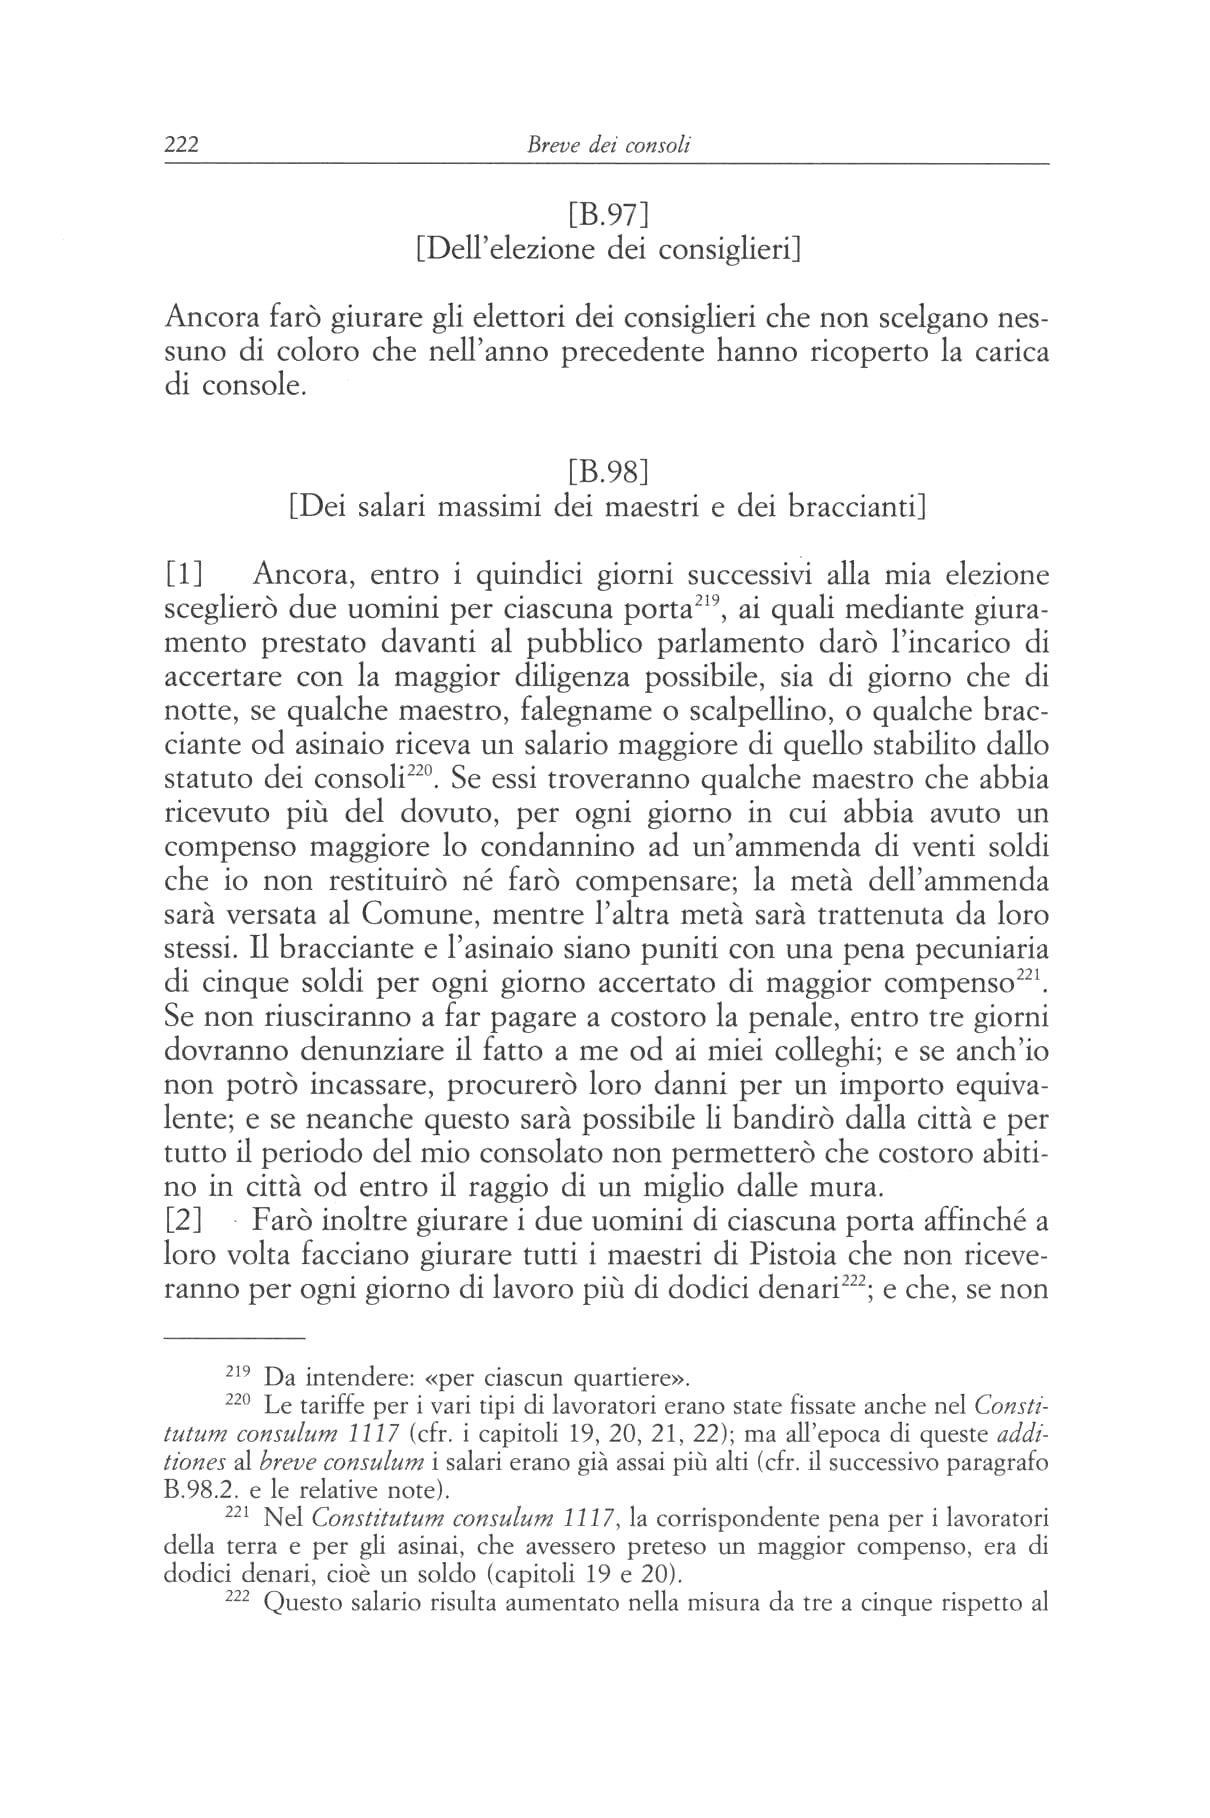 statuti pistoiesi del sec.XII 0222.jpg